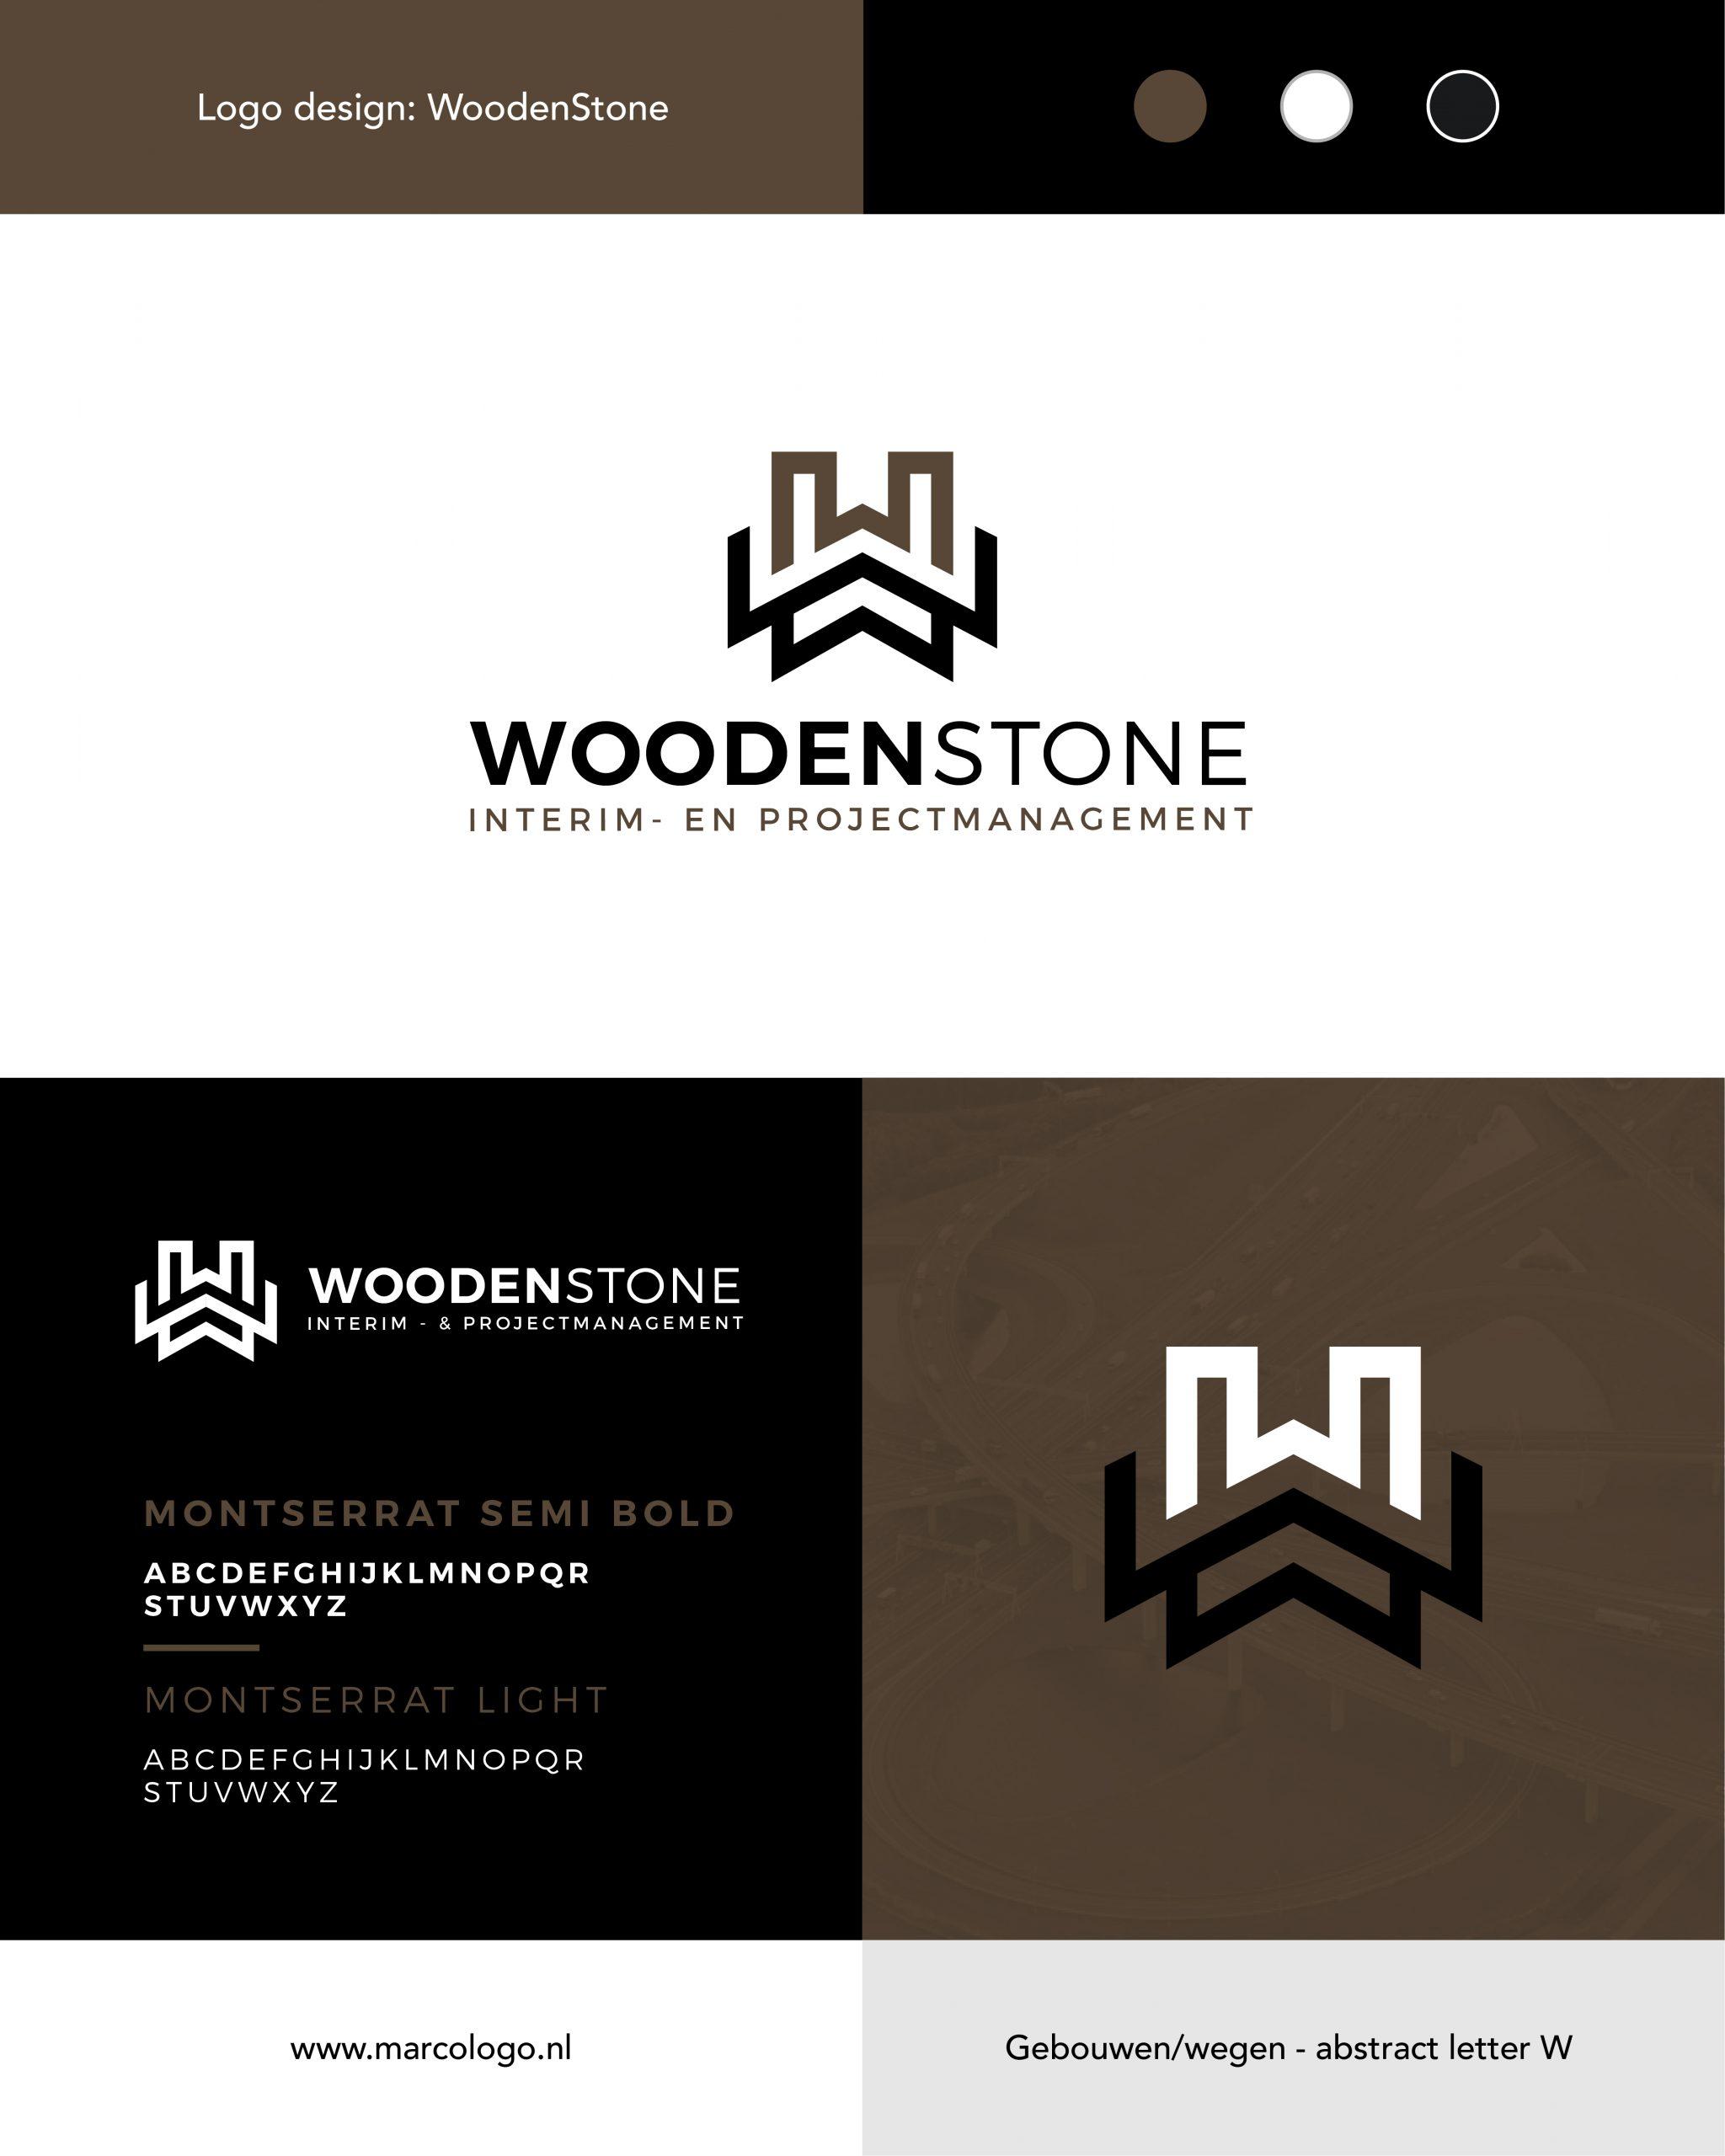 WoodenStone-logo_4.1